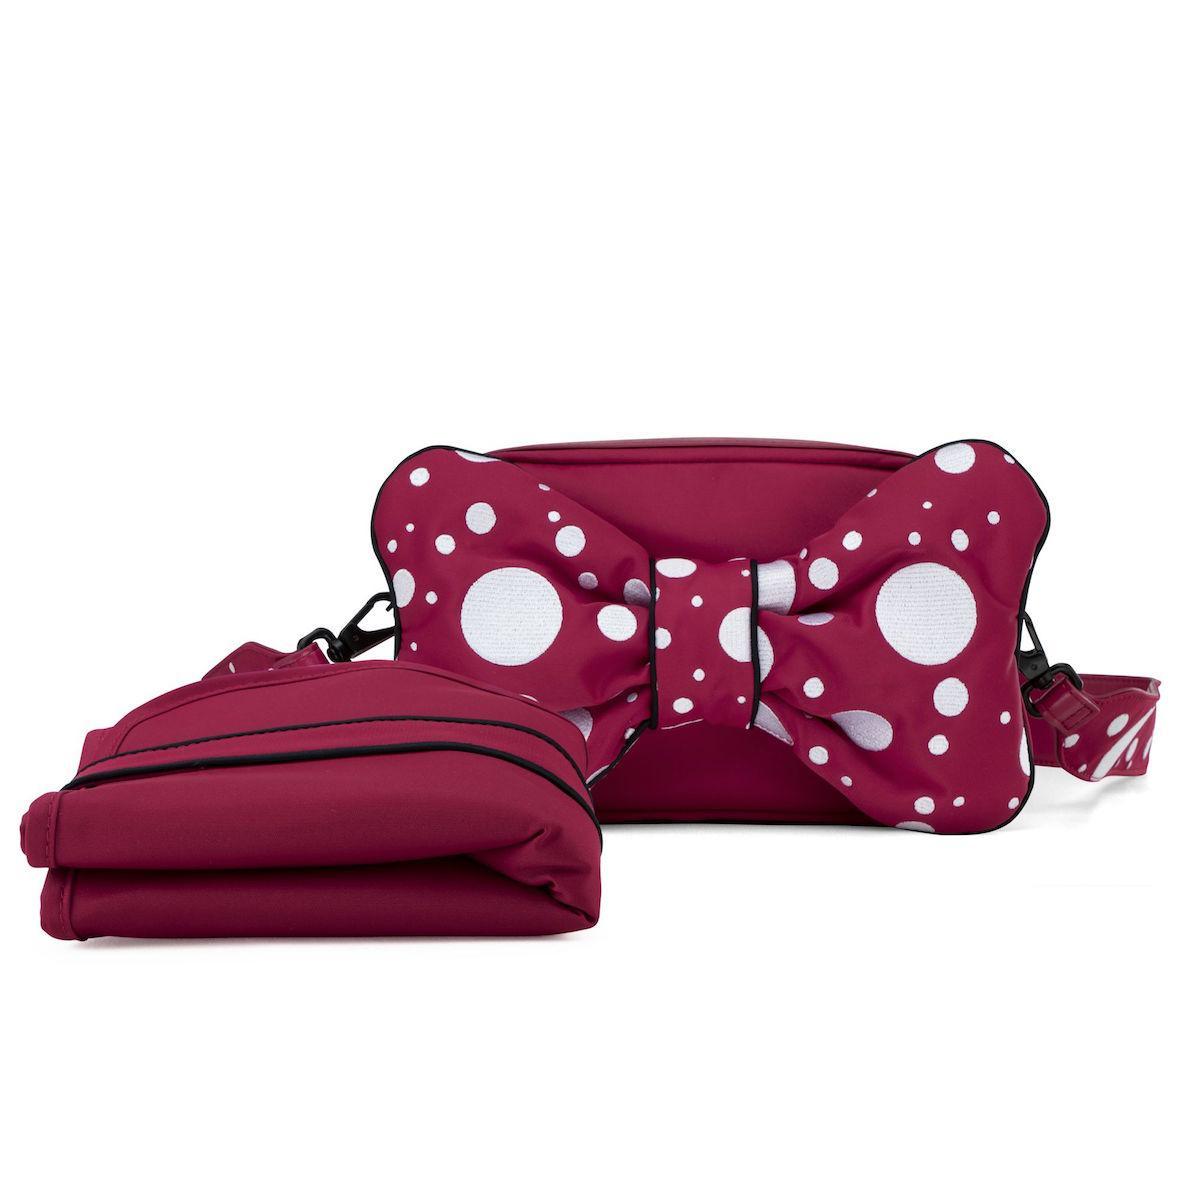 Sac à langer Cybex Petticoat Red dark red